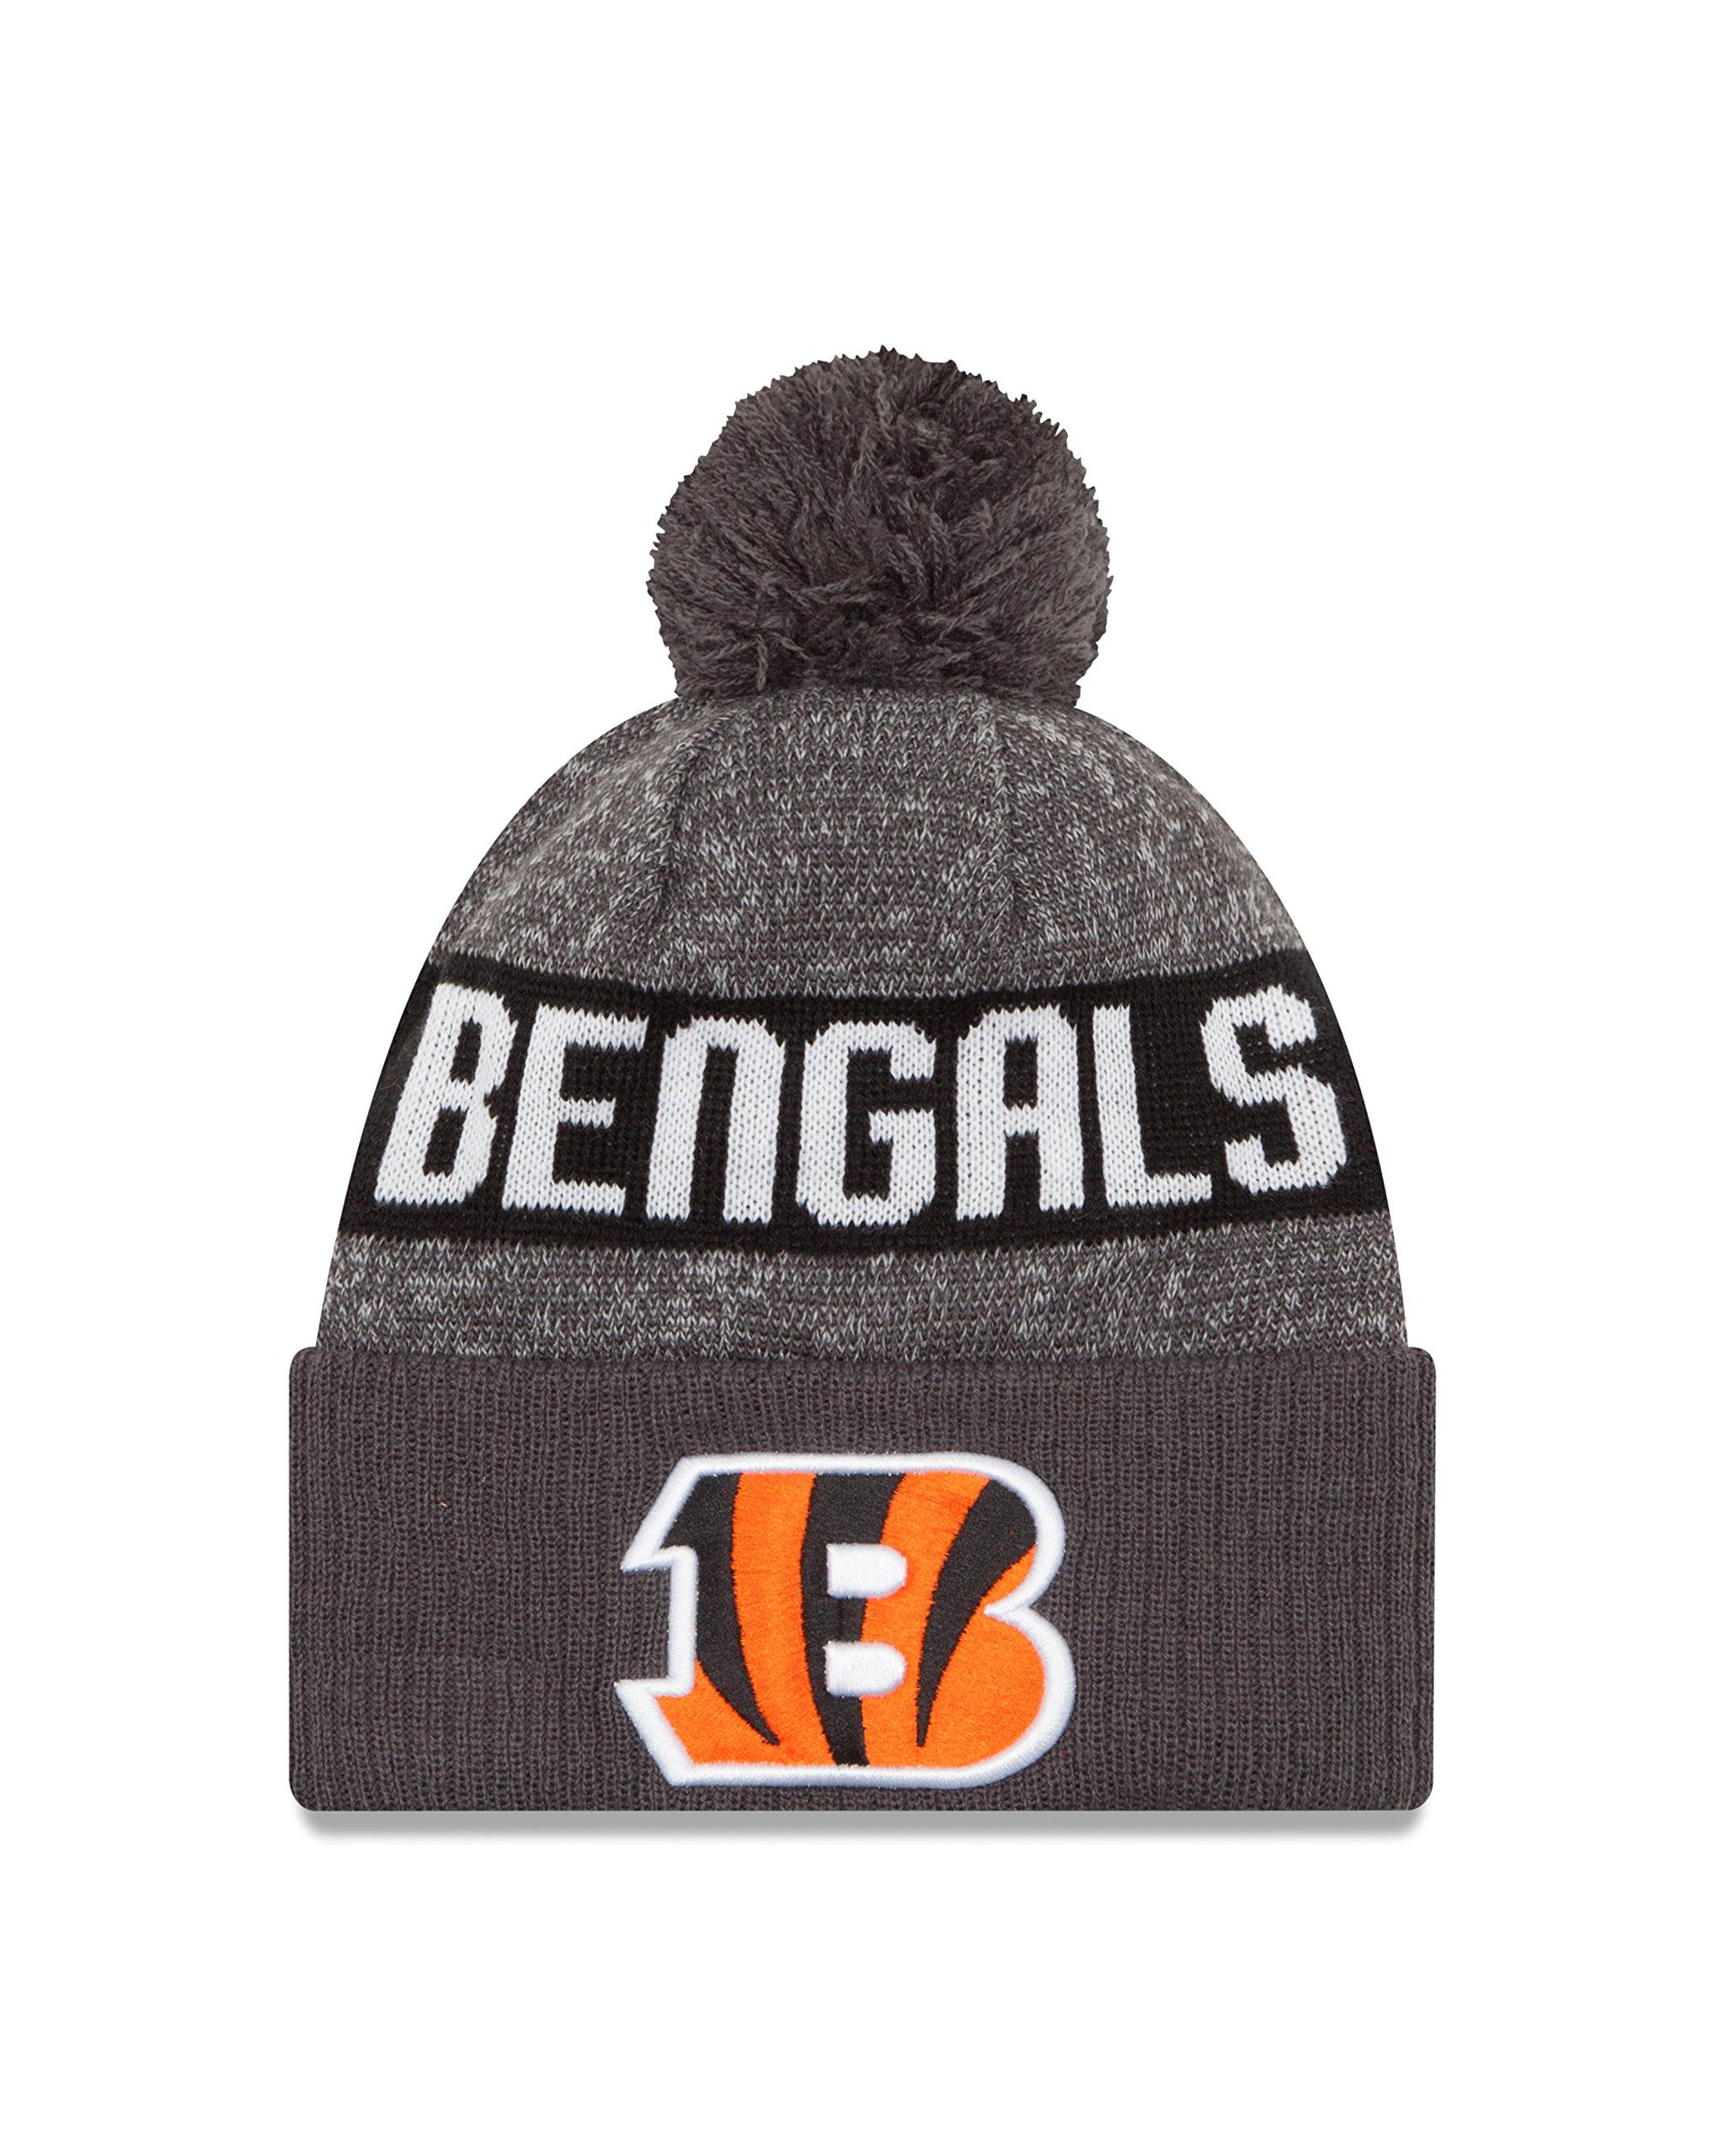 New Era NFL Cincinnati Bengals 2016 Sport Knit Beanie, One Size, Graphite